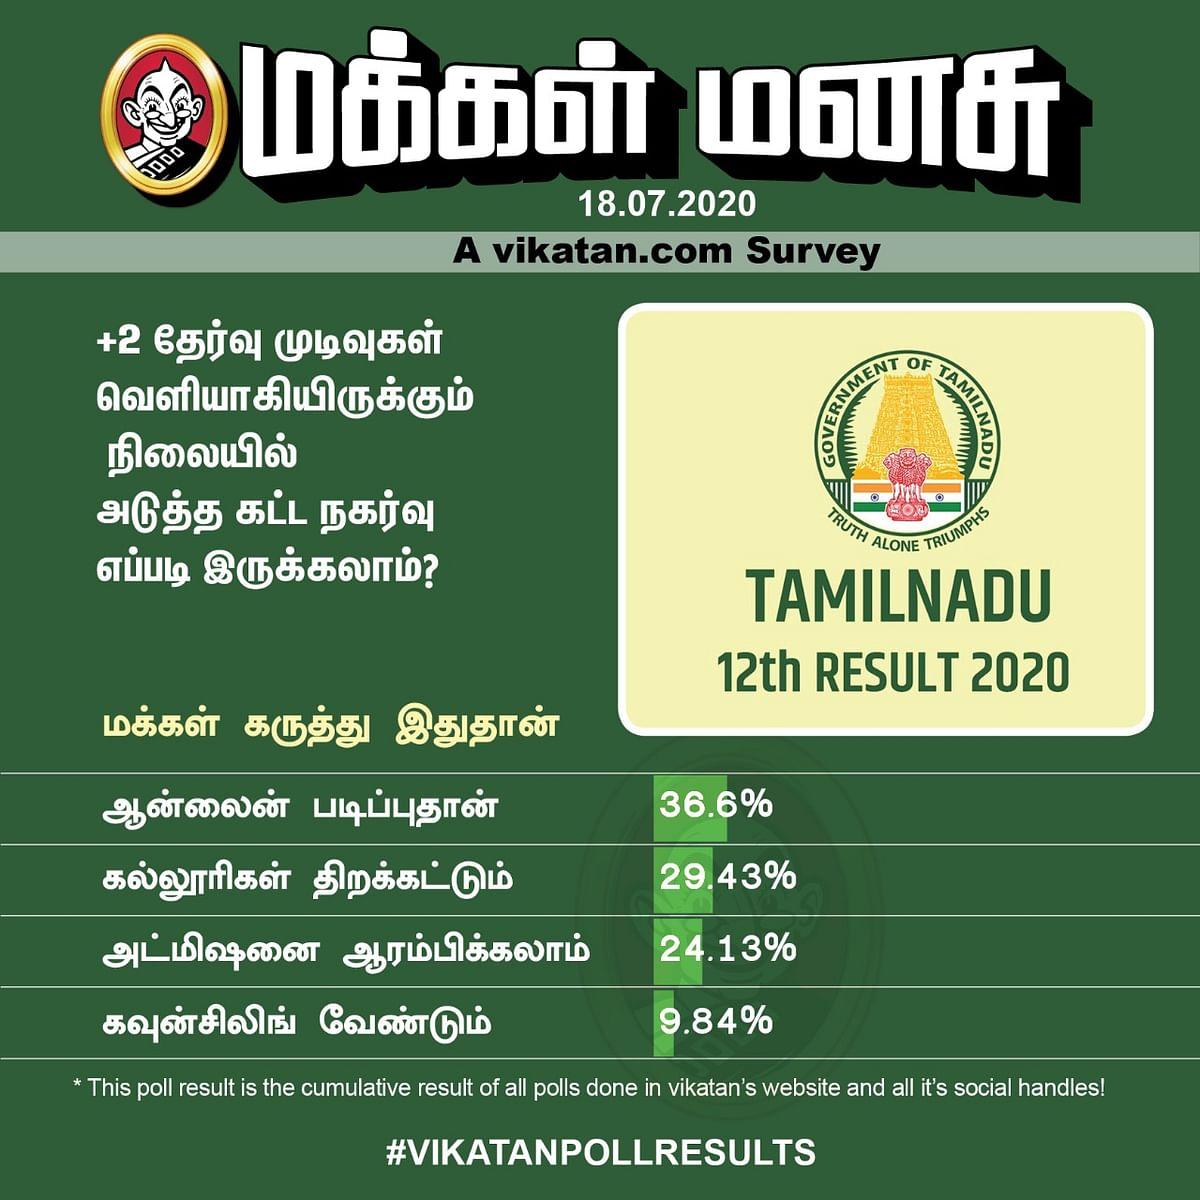 +2 Results   Vikatan Poll